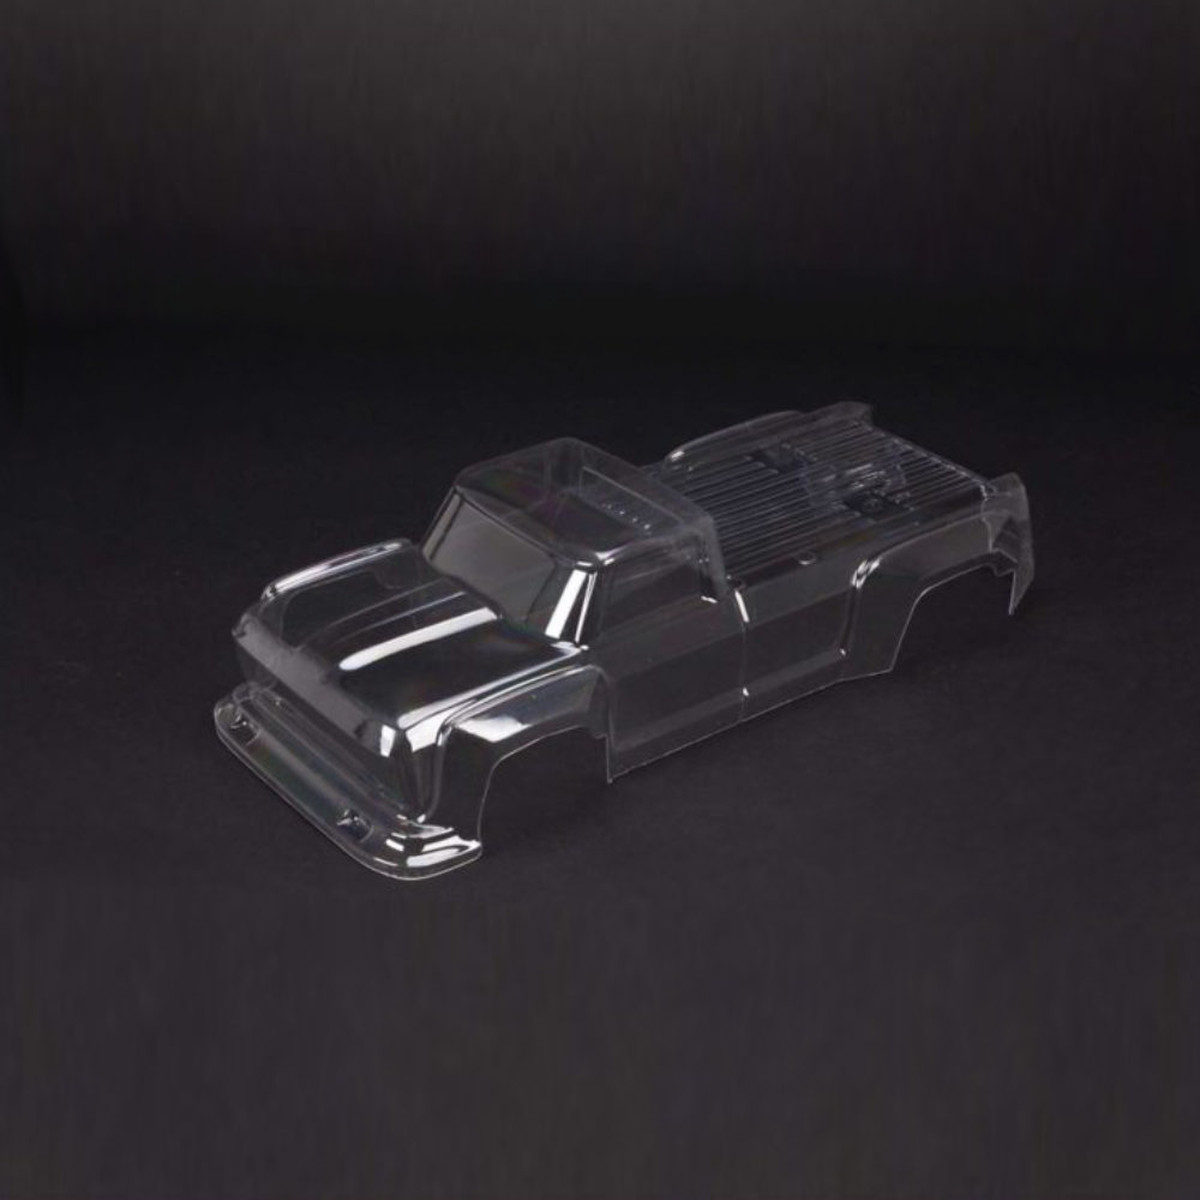 Mini-Z Karosserie 1:24 Subaru BRZ unlackiert MR-03N-RM MR-015-RM Kyosho MZN-150